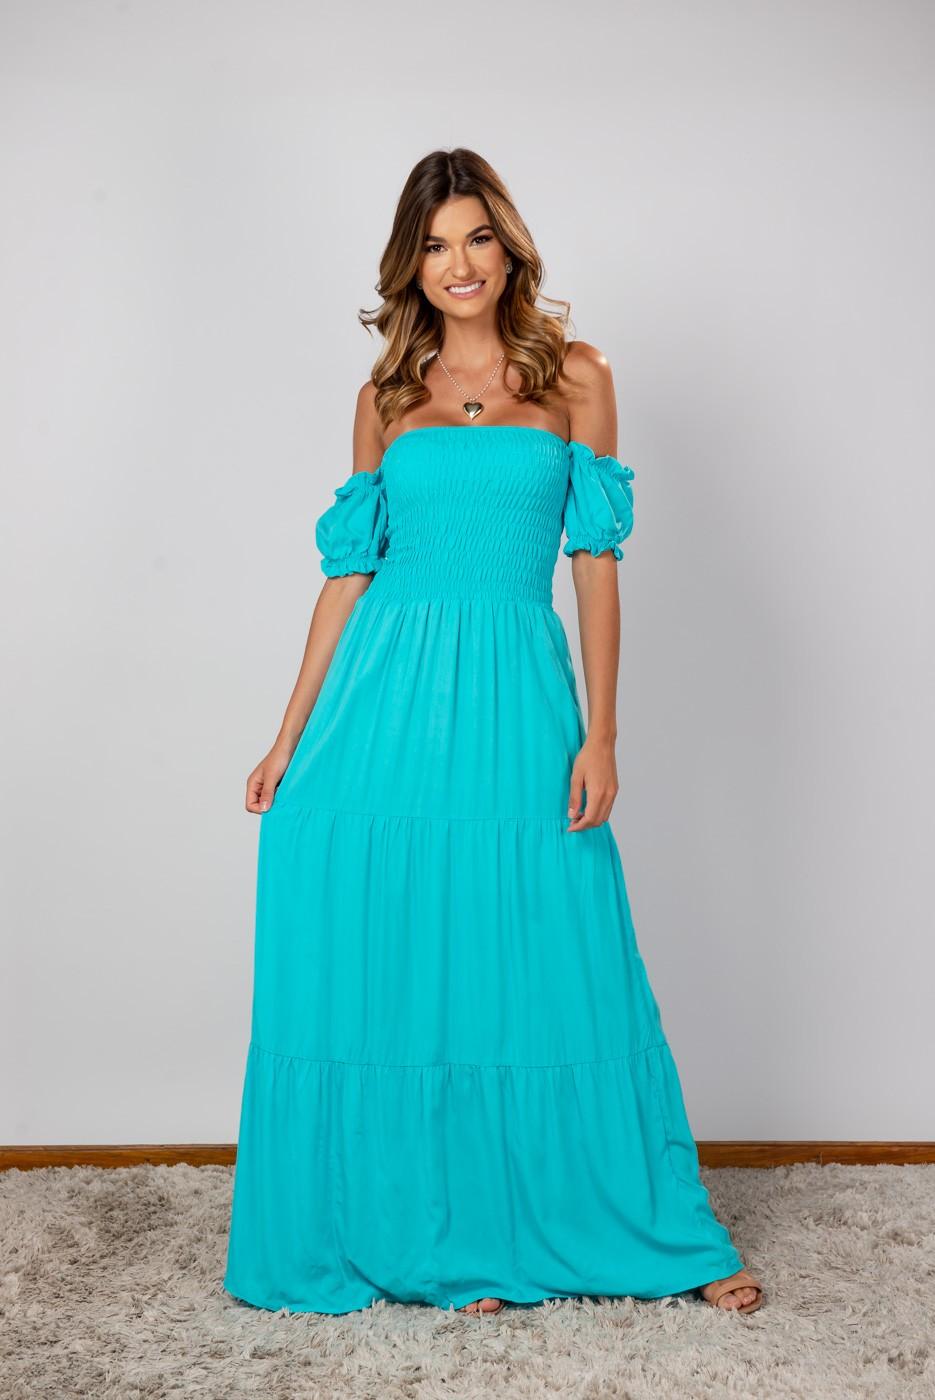 Vestido Lastex Ombro Azul Piscina